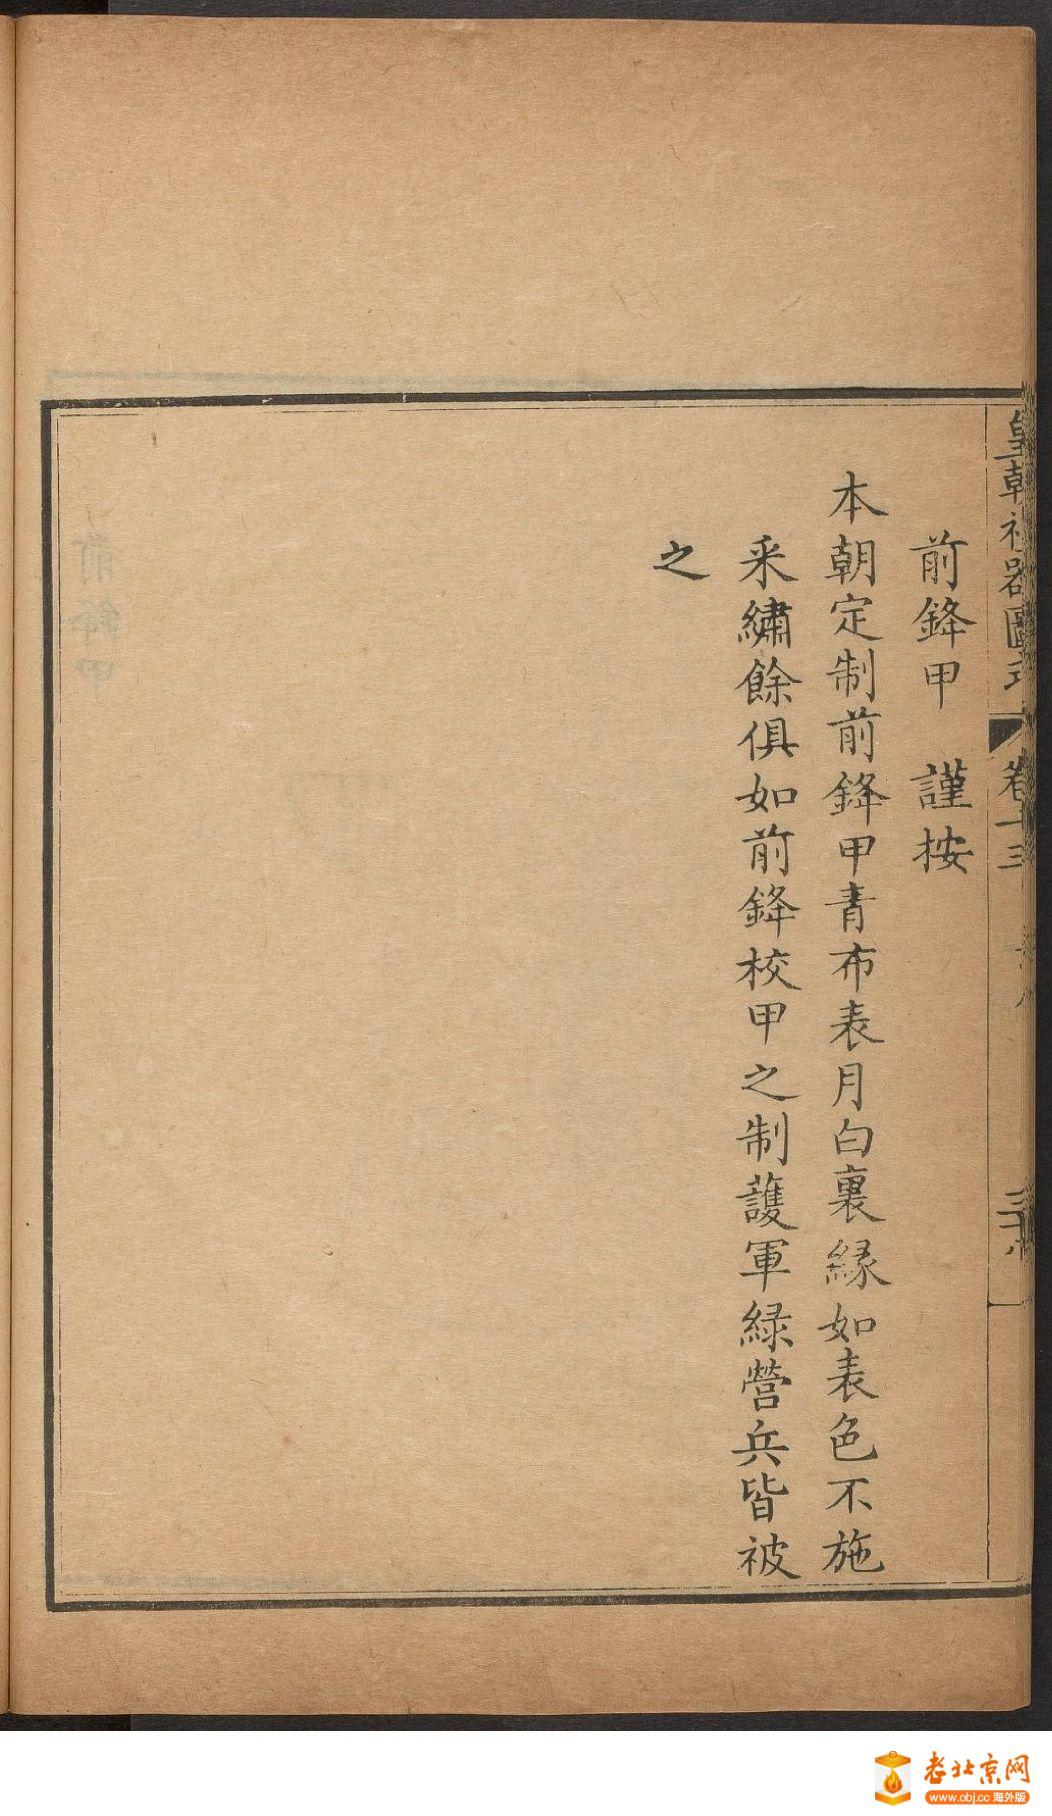 4_page9_image1b.jpg